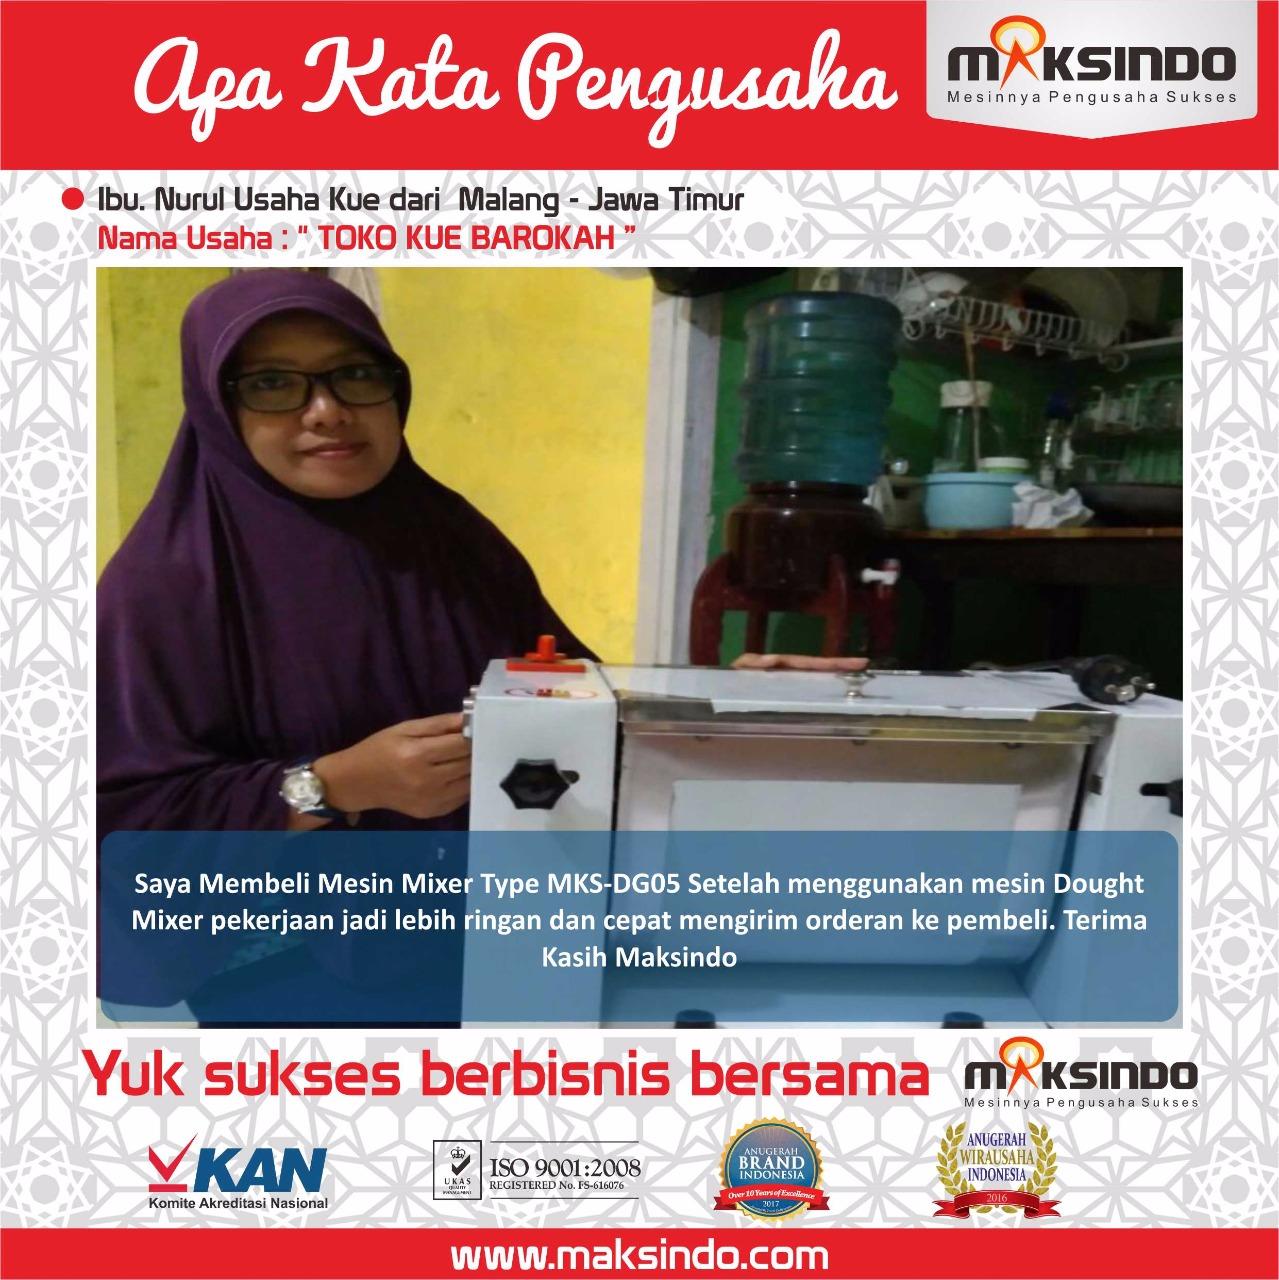 Toko Kue Barokah : Usaha Saya Lebih Ringan Dan Cepat dengan Mesin Dough Mixer Maksindo